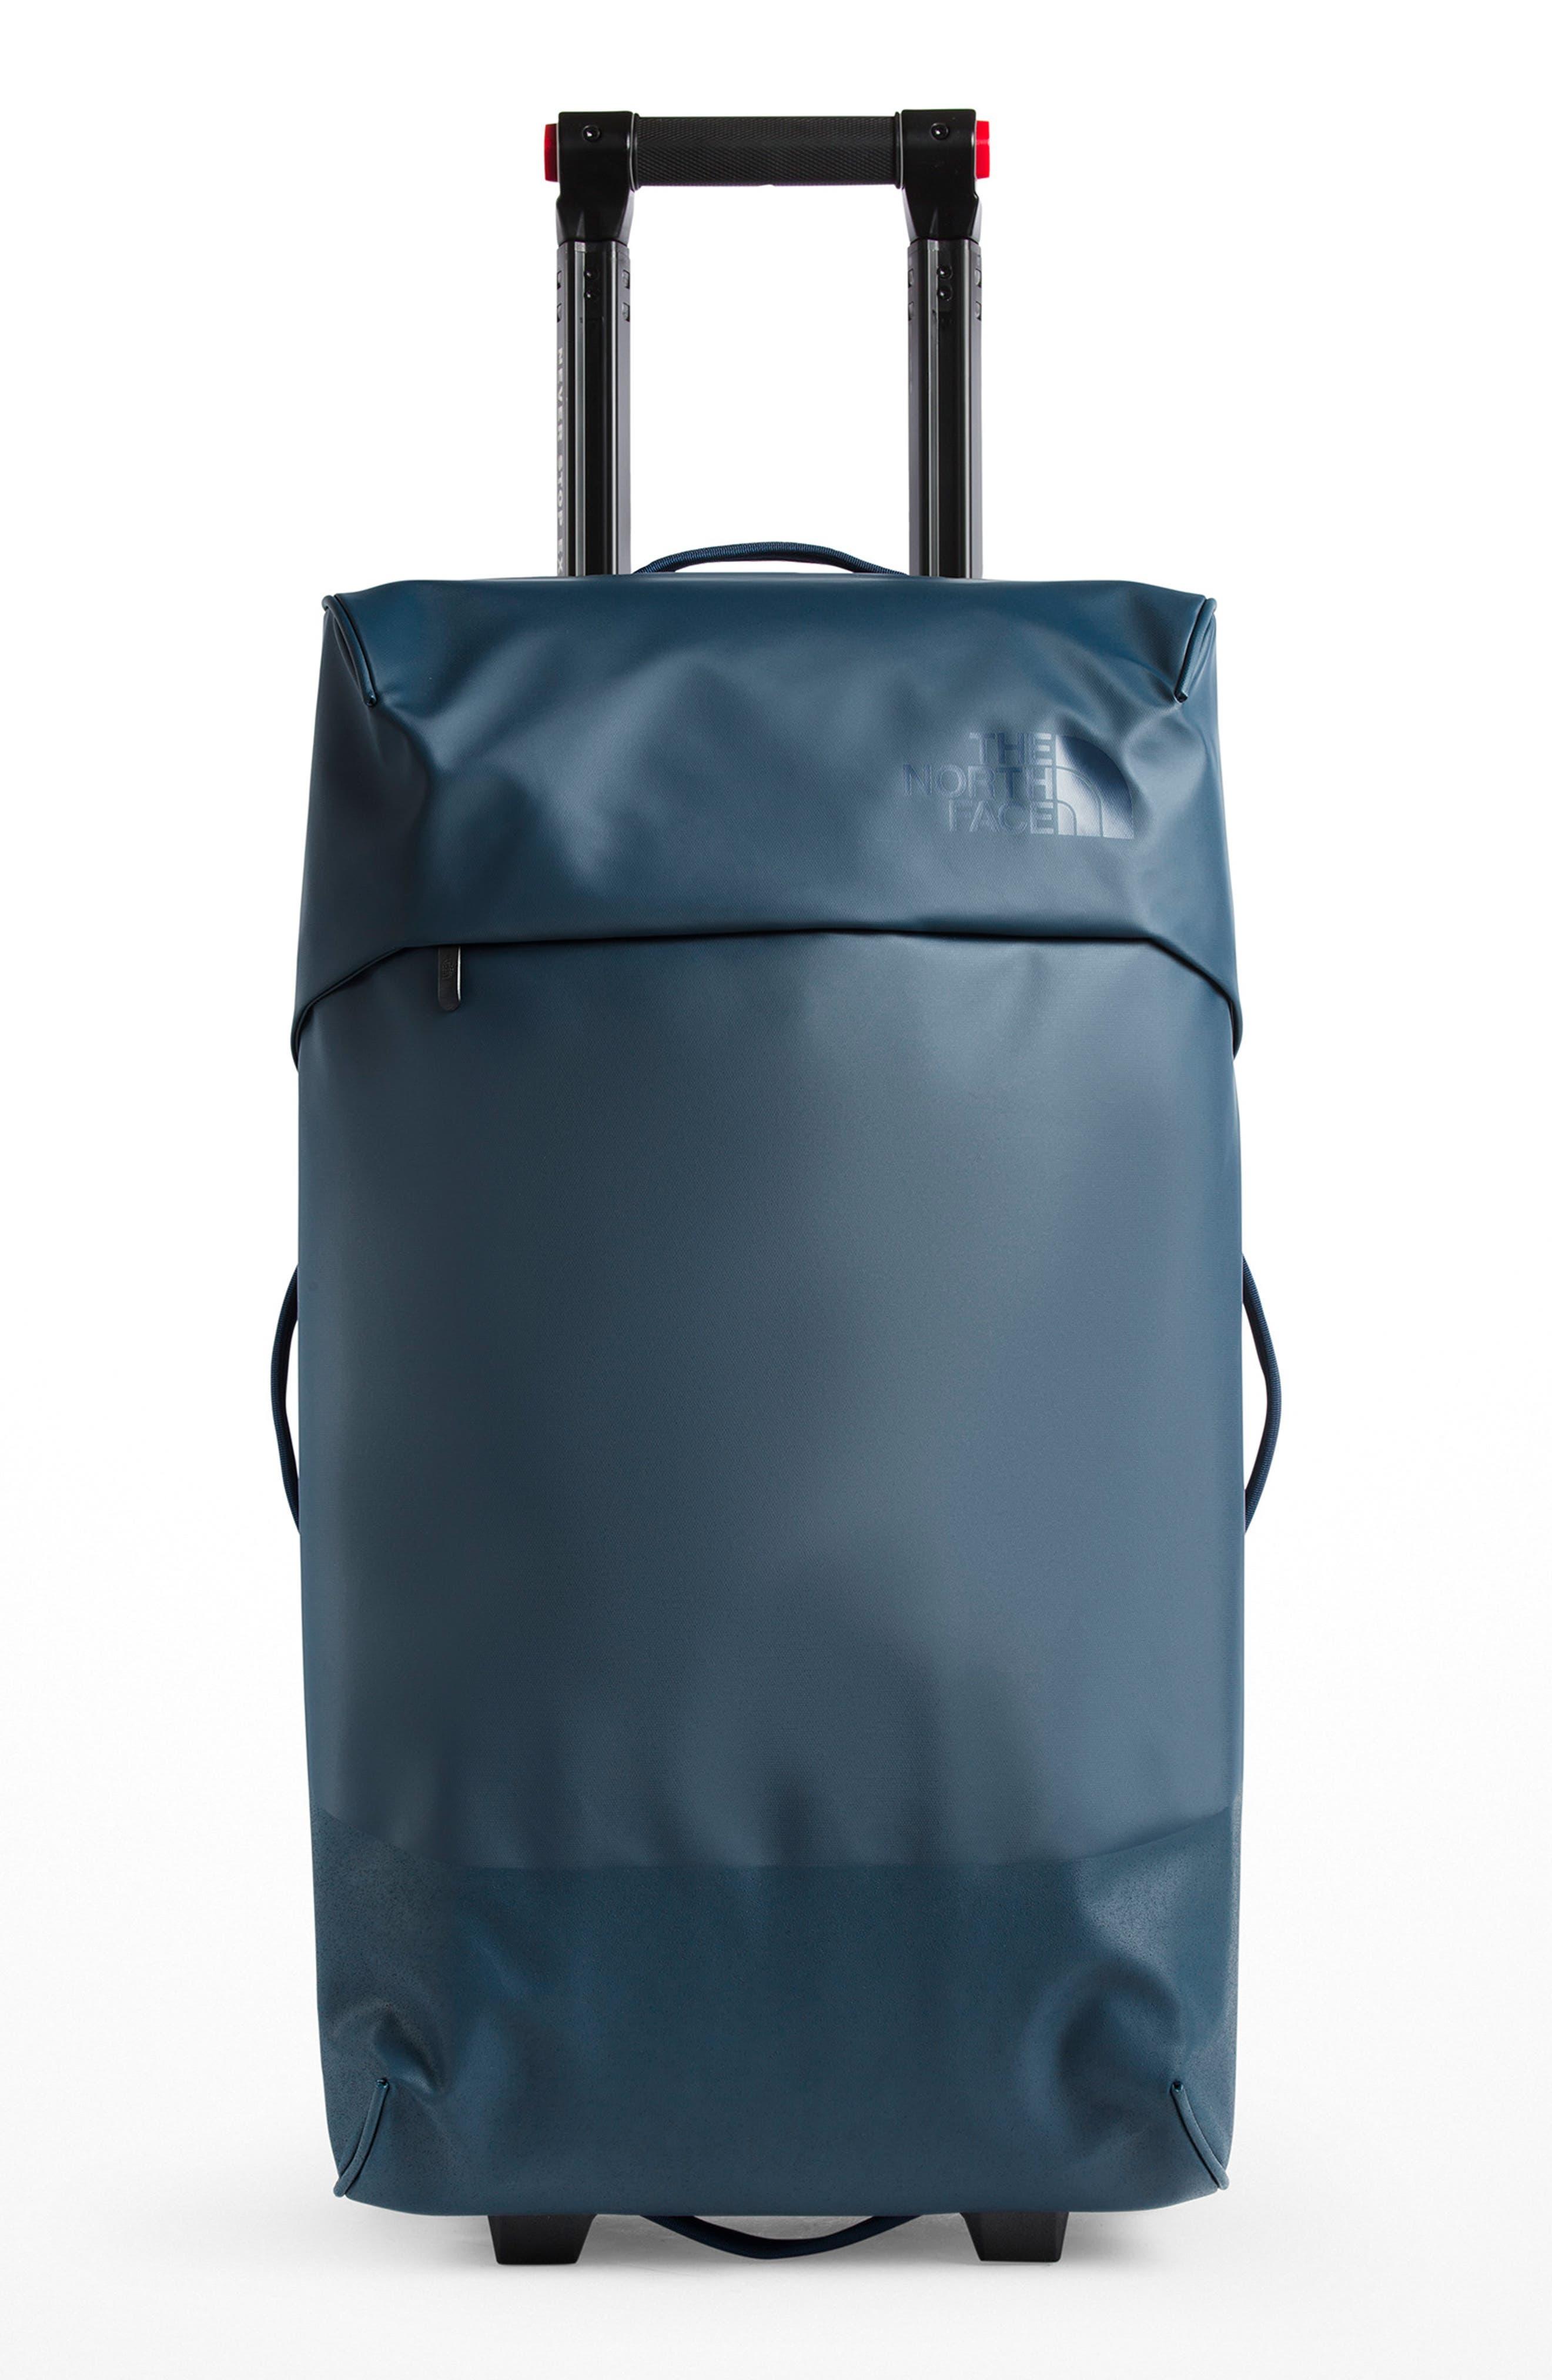 Stratoliner Large Wheeled Suitcase,                             Main thumbnail 1, color,                             Navy